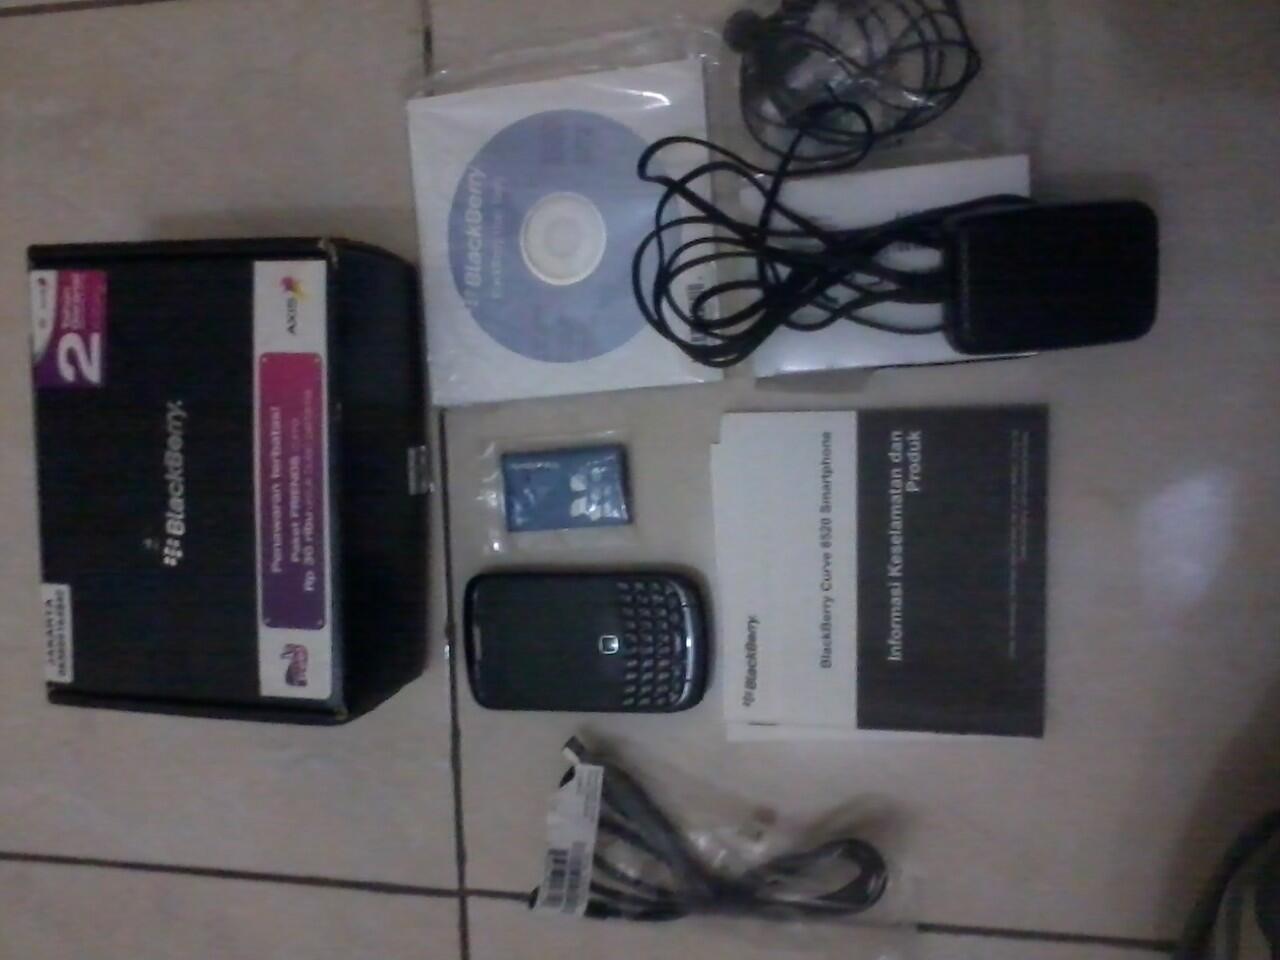 blackberry gemini 8520 bb gemini hitam mulus lengkap tangan pertama